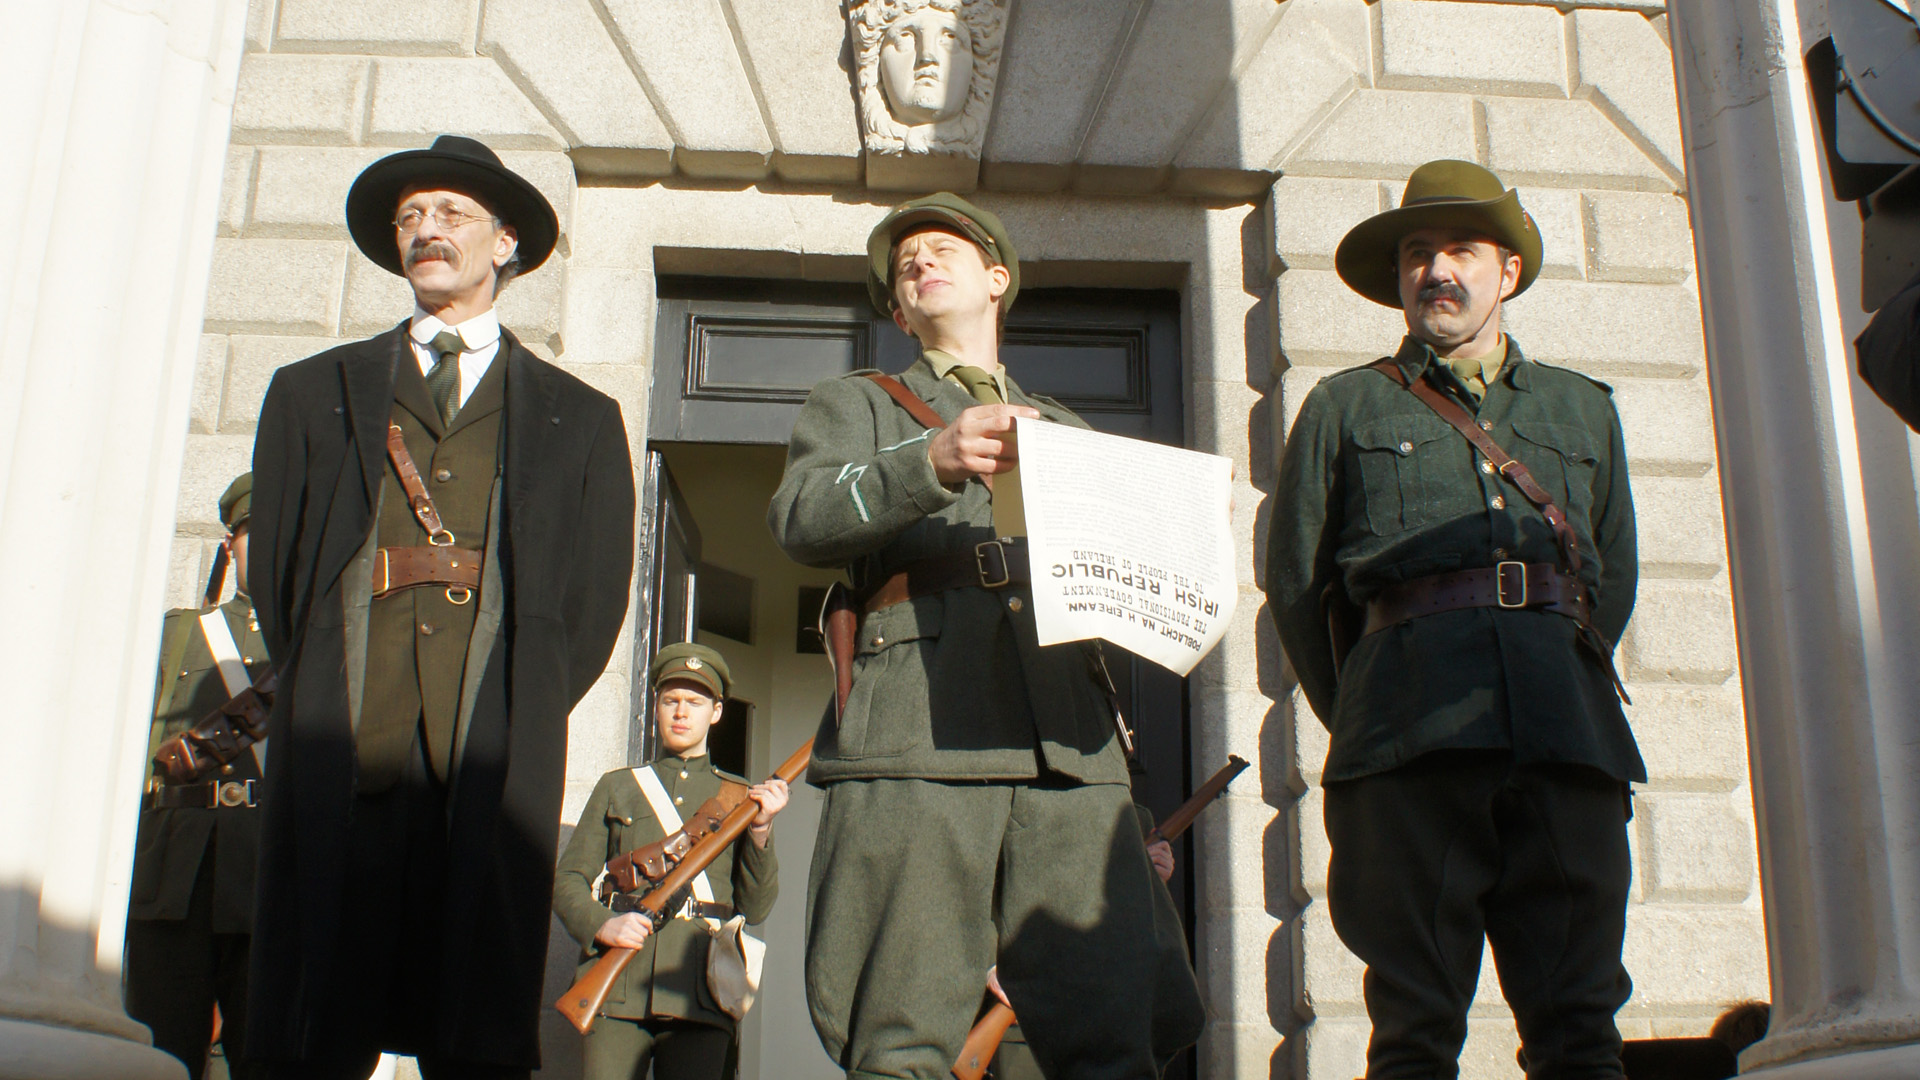 Network-Ireland-Television-Easter-1916-2-NITV.jpg